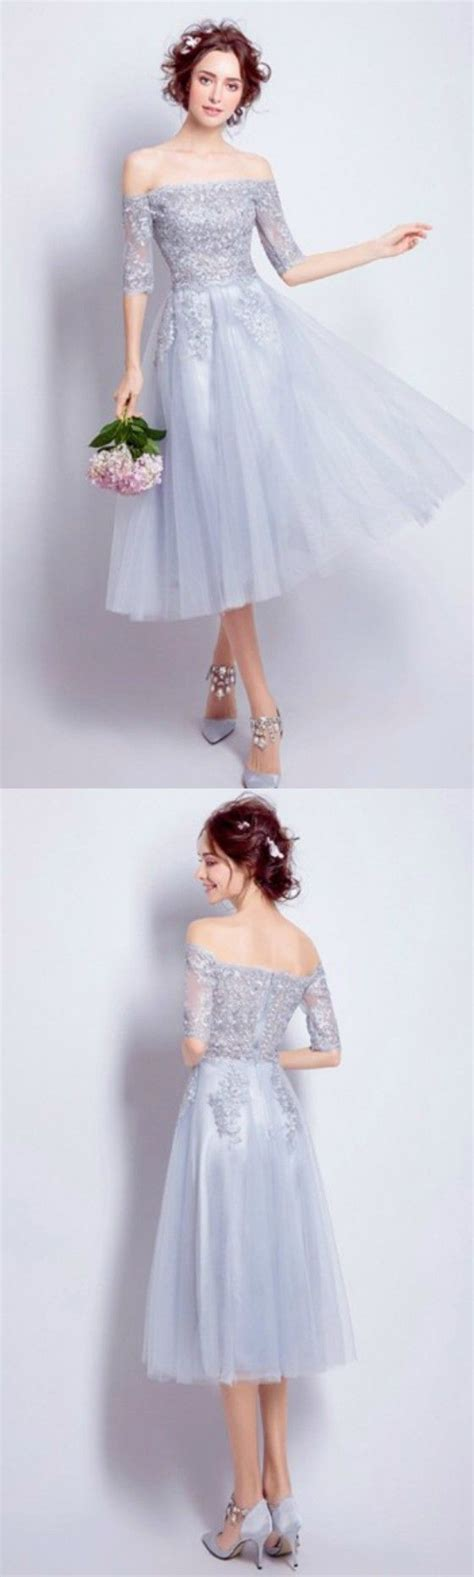 [$108.99] Best A Line Short Party Dresses Off the Shoulder ...